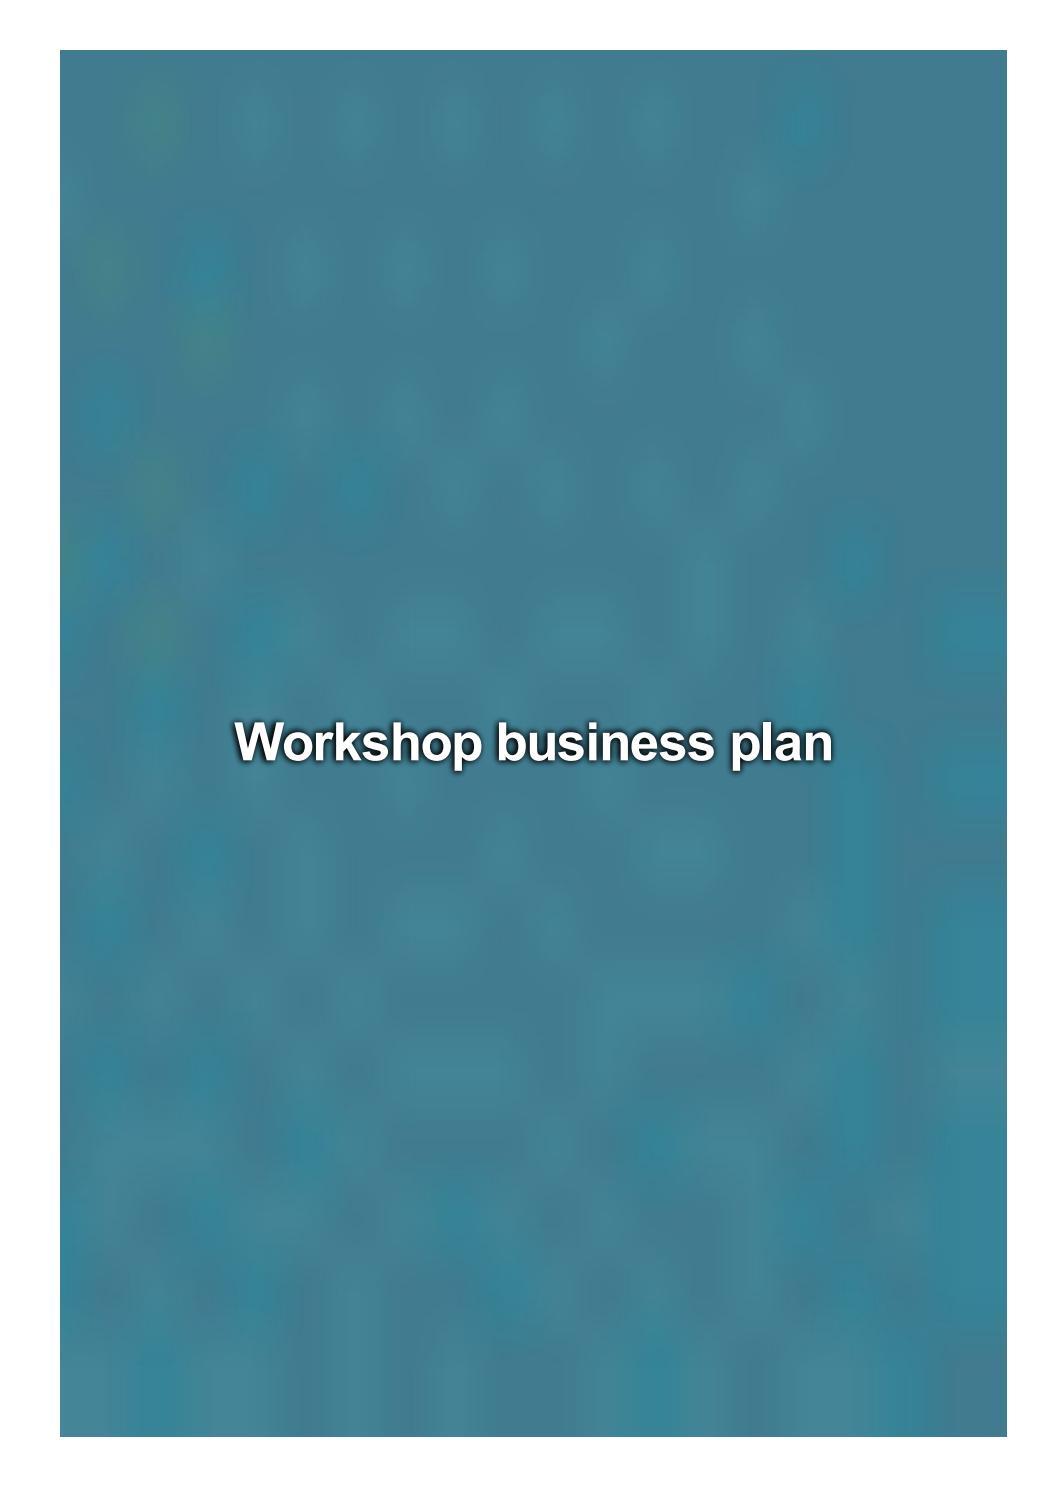 visual business plan workshop